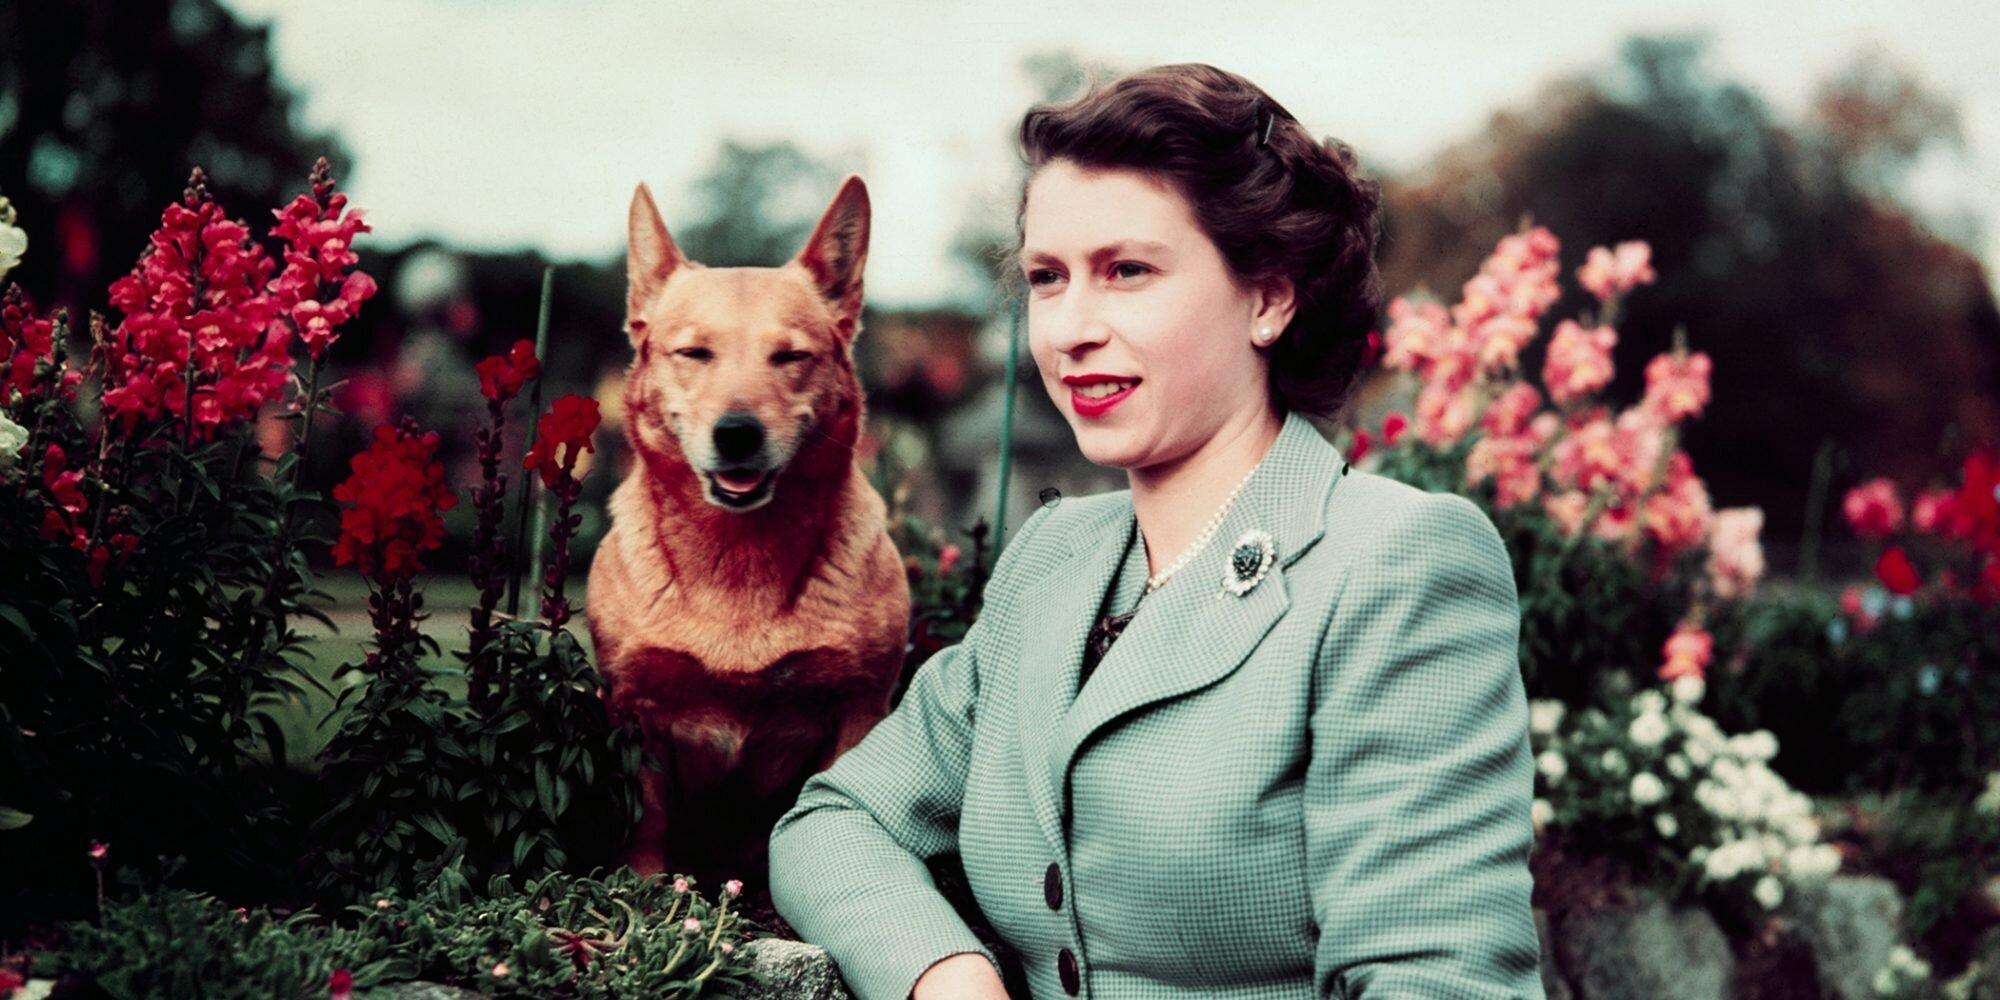 A Timeline of Queen Elizabeth's Lifelong Love of Corgis